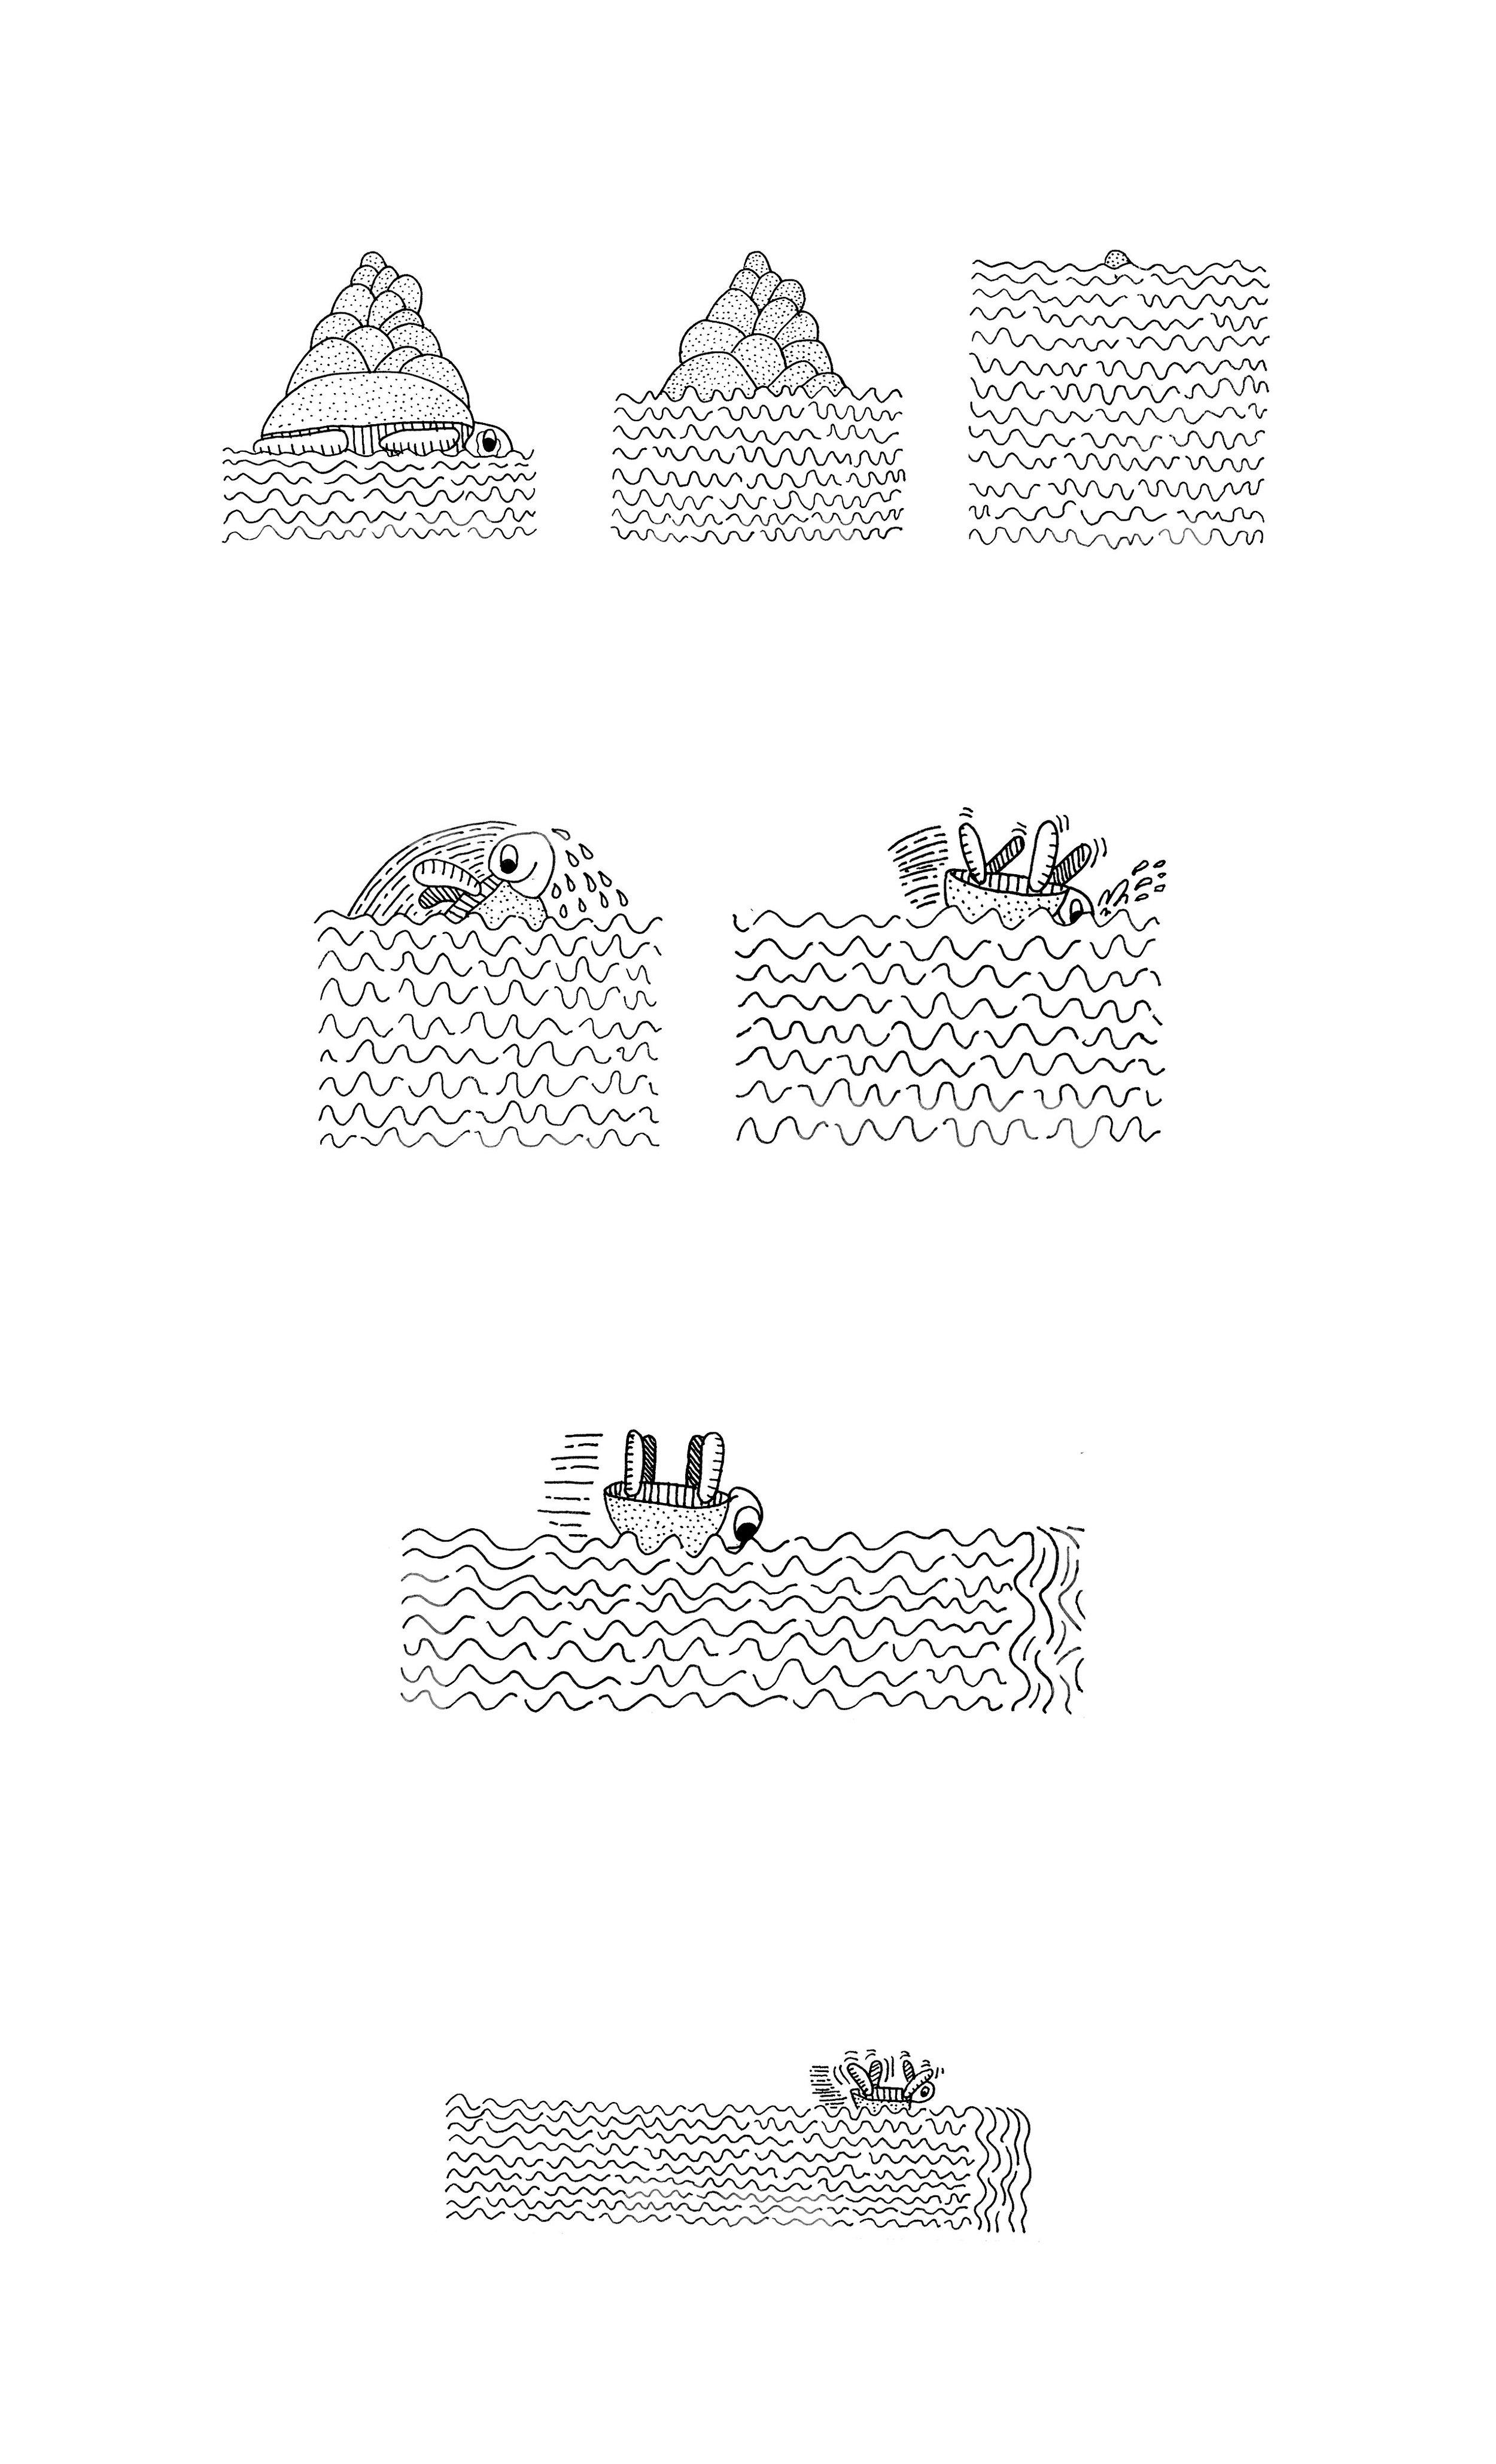 oscillator_page13.jpg